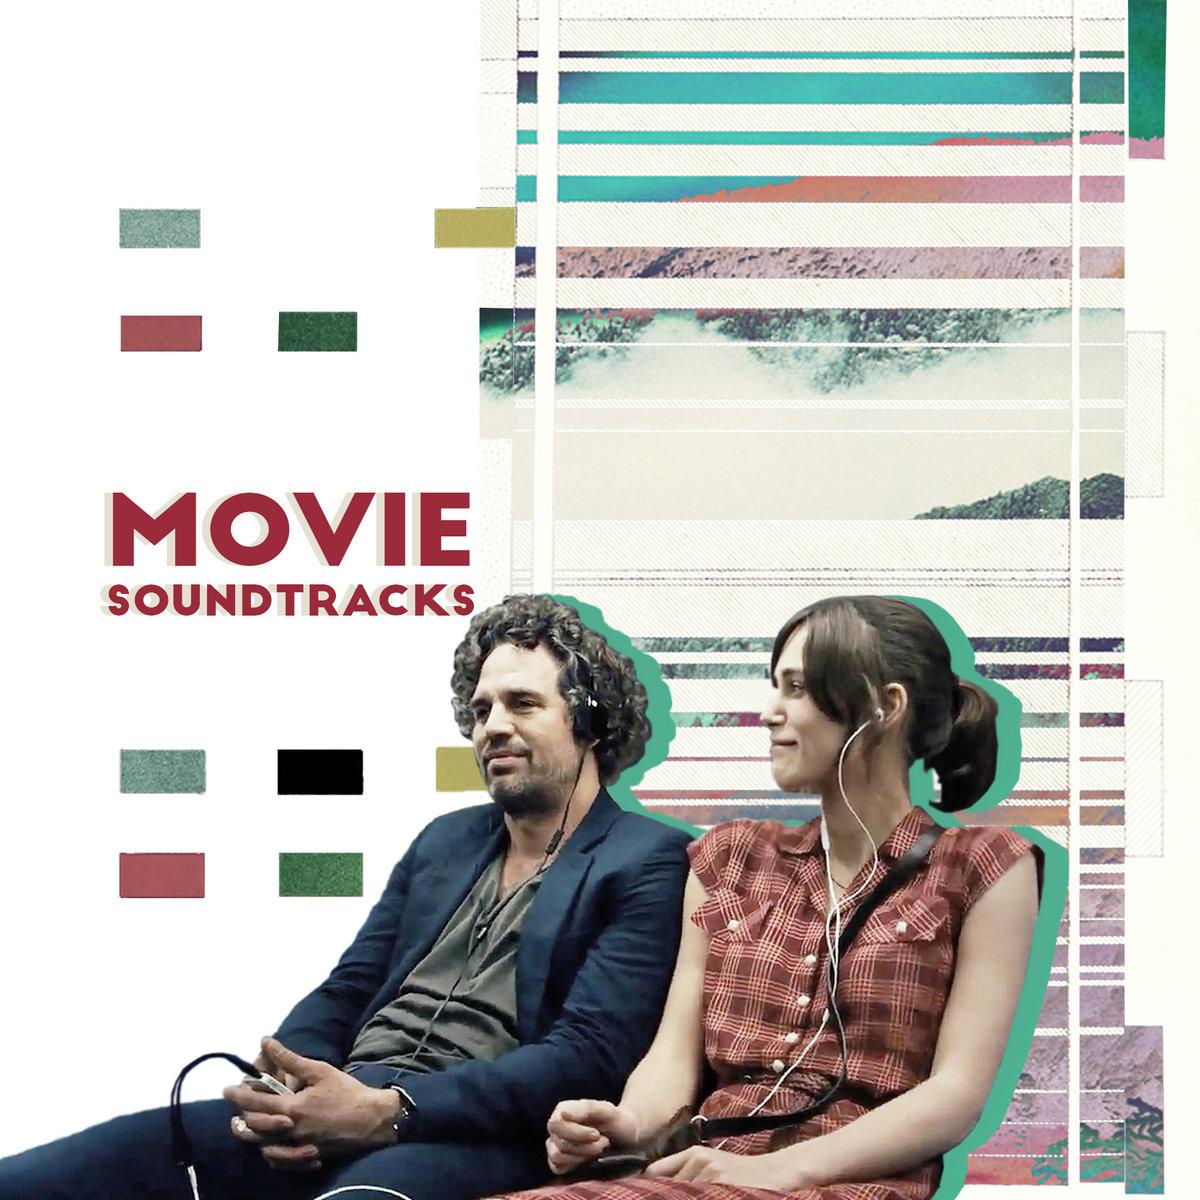 My Best Friend S Wedding Soundtrack.The Way You Look Tonight My Best Friend S Wedding By Frank